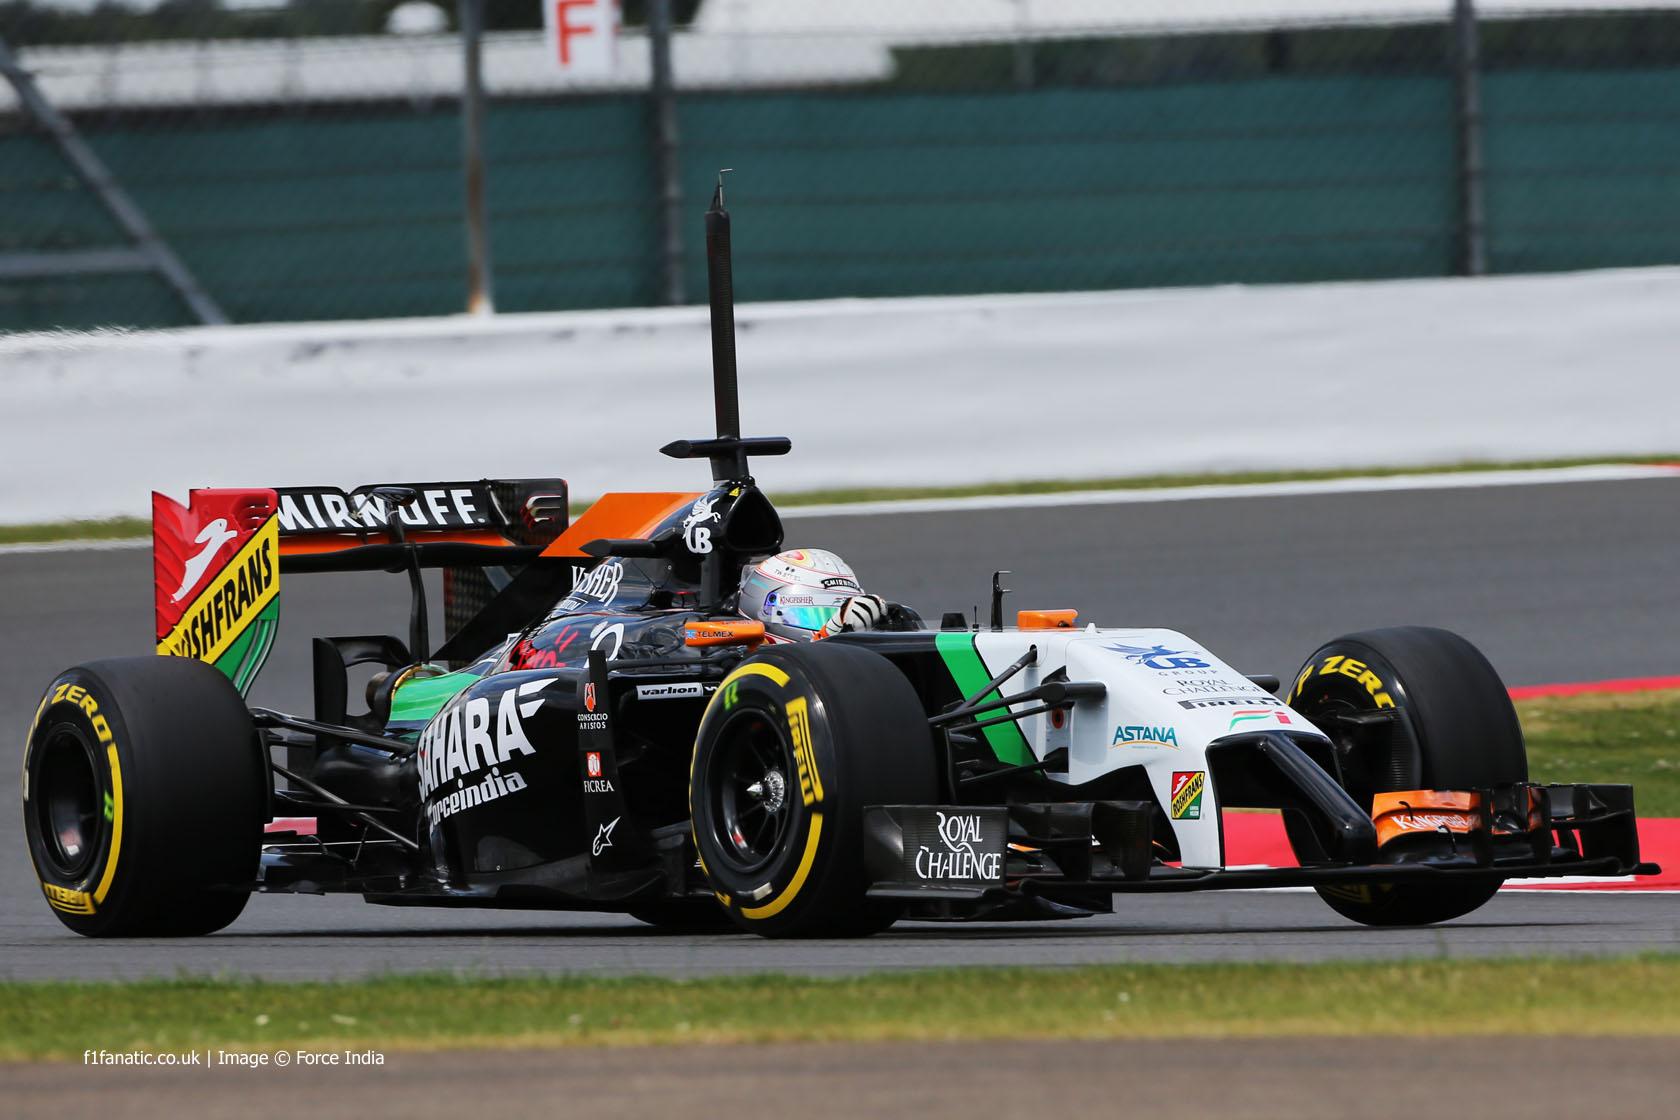 Daniel Juncadella, Force India, Silverstone test, 2014